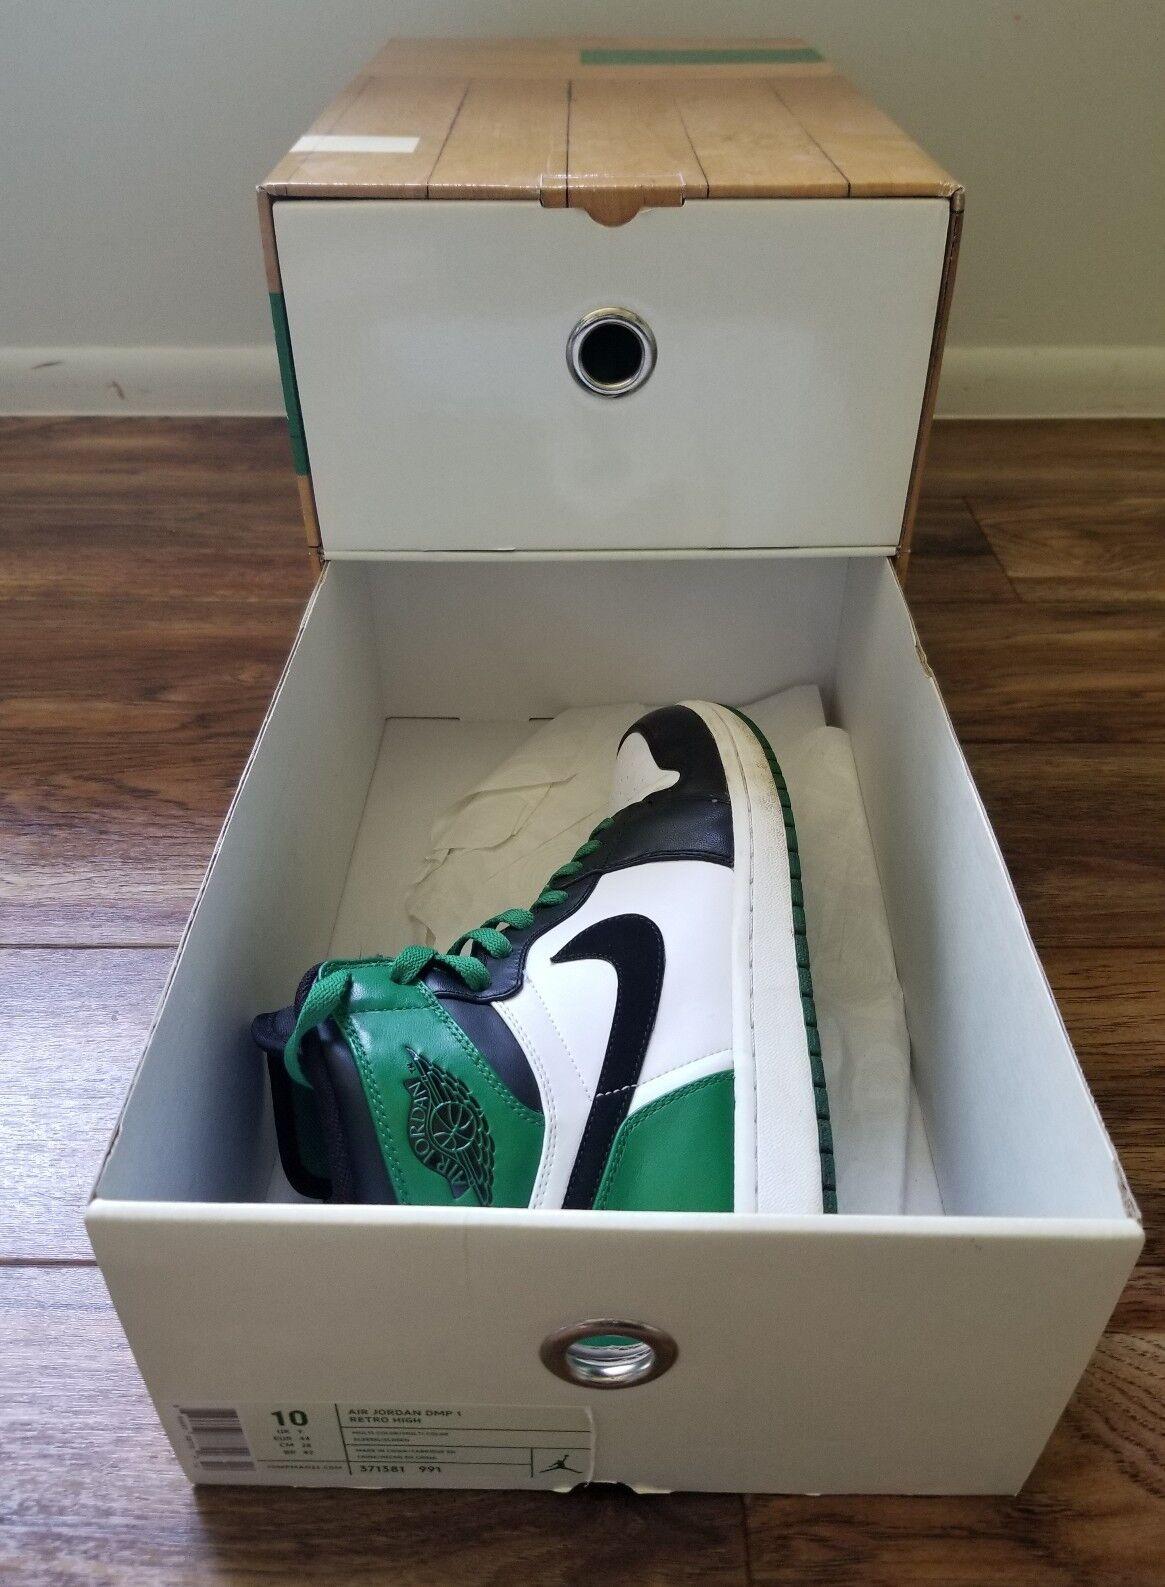 Air Jordan DMP 1 Retro High (Black/Green/White) Men's Sz 10 With Box Celtics